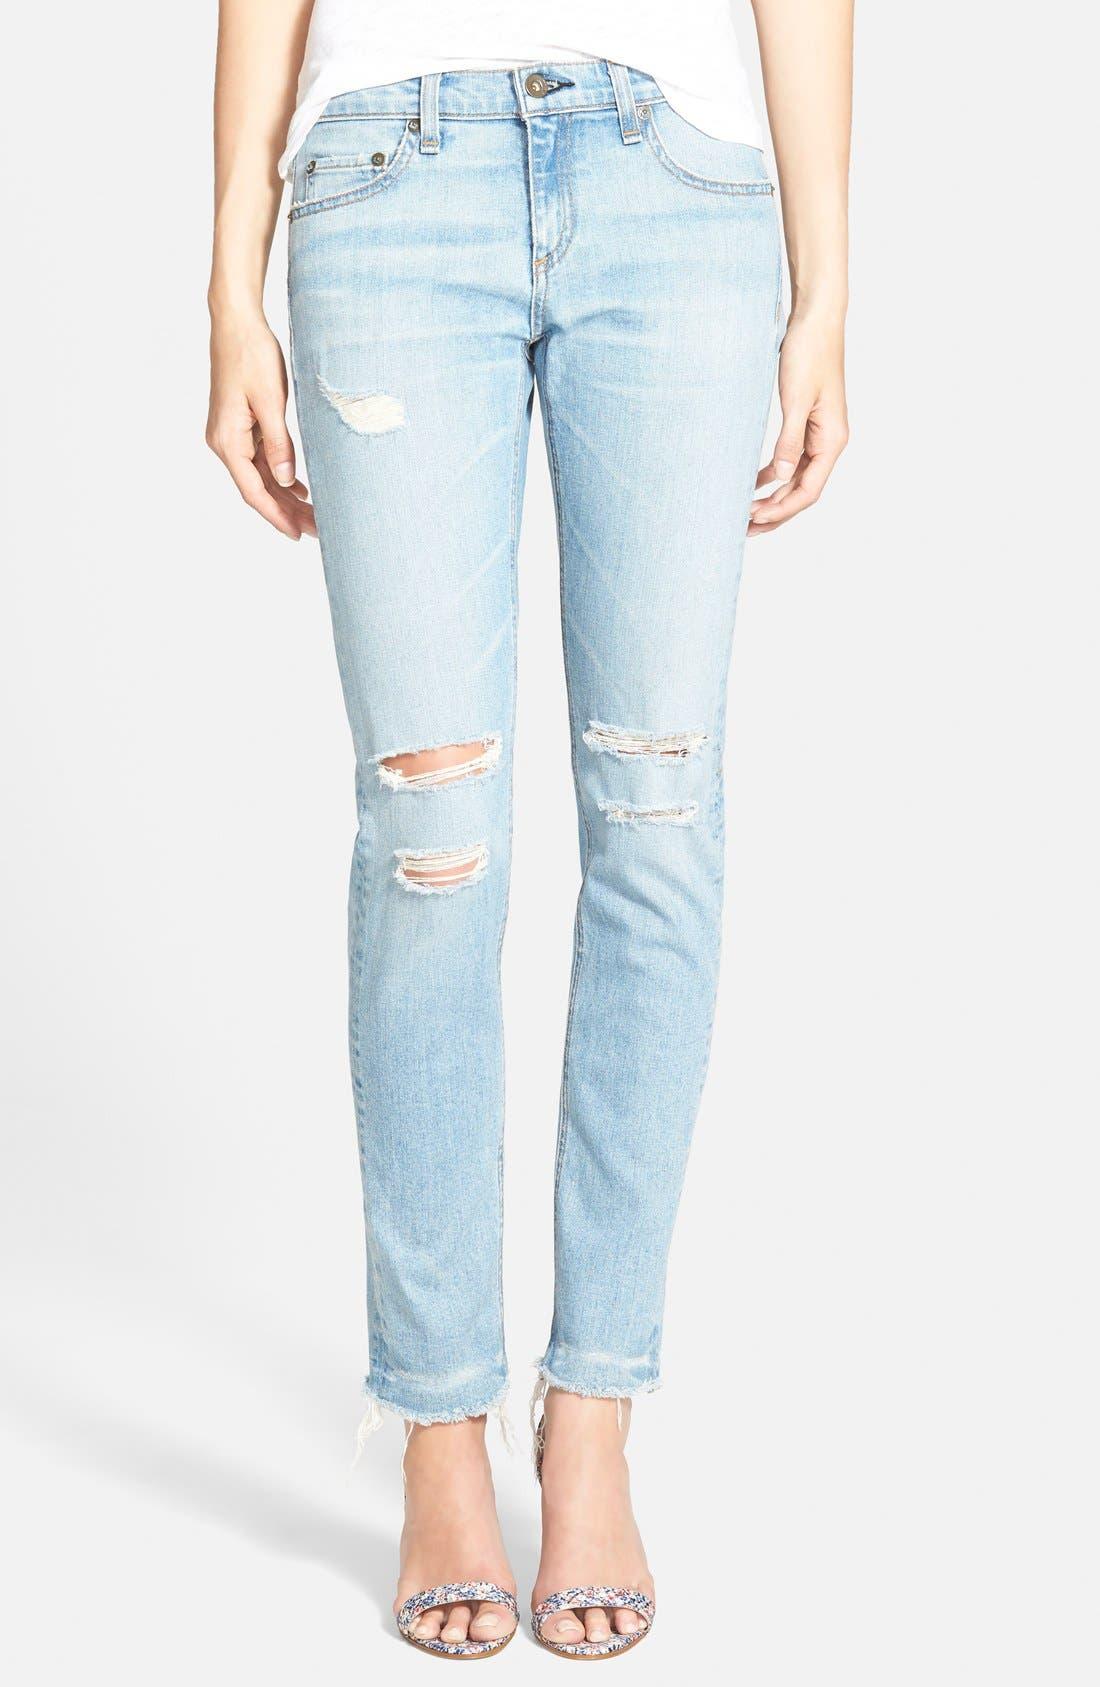 Main Image - rag & bone/JEAN 'Dre' Distressed Ankle Jeans (Abingdon)